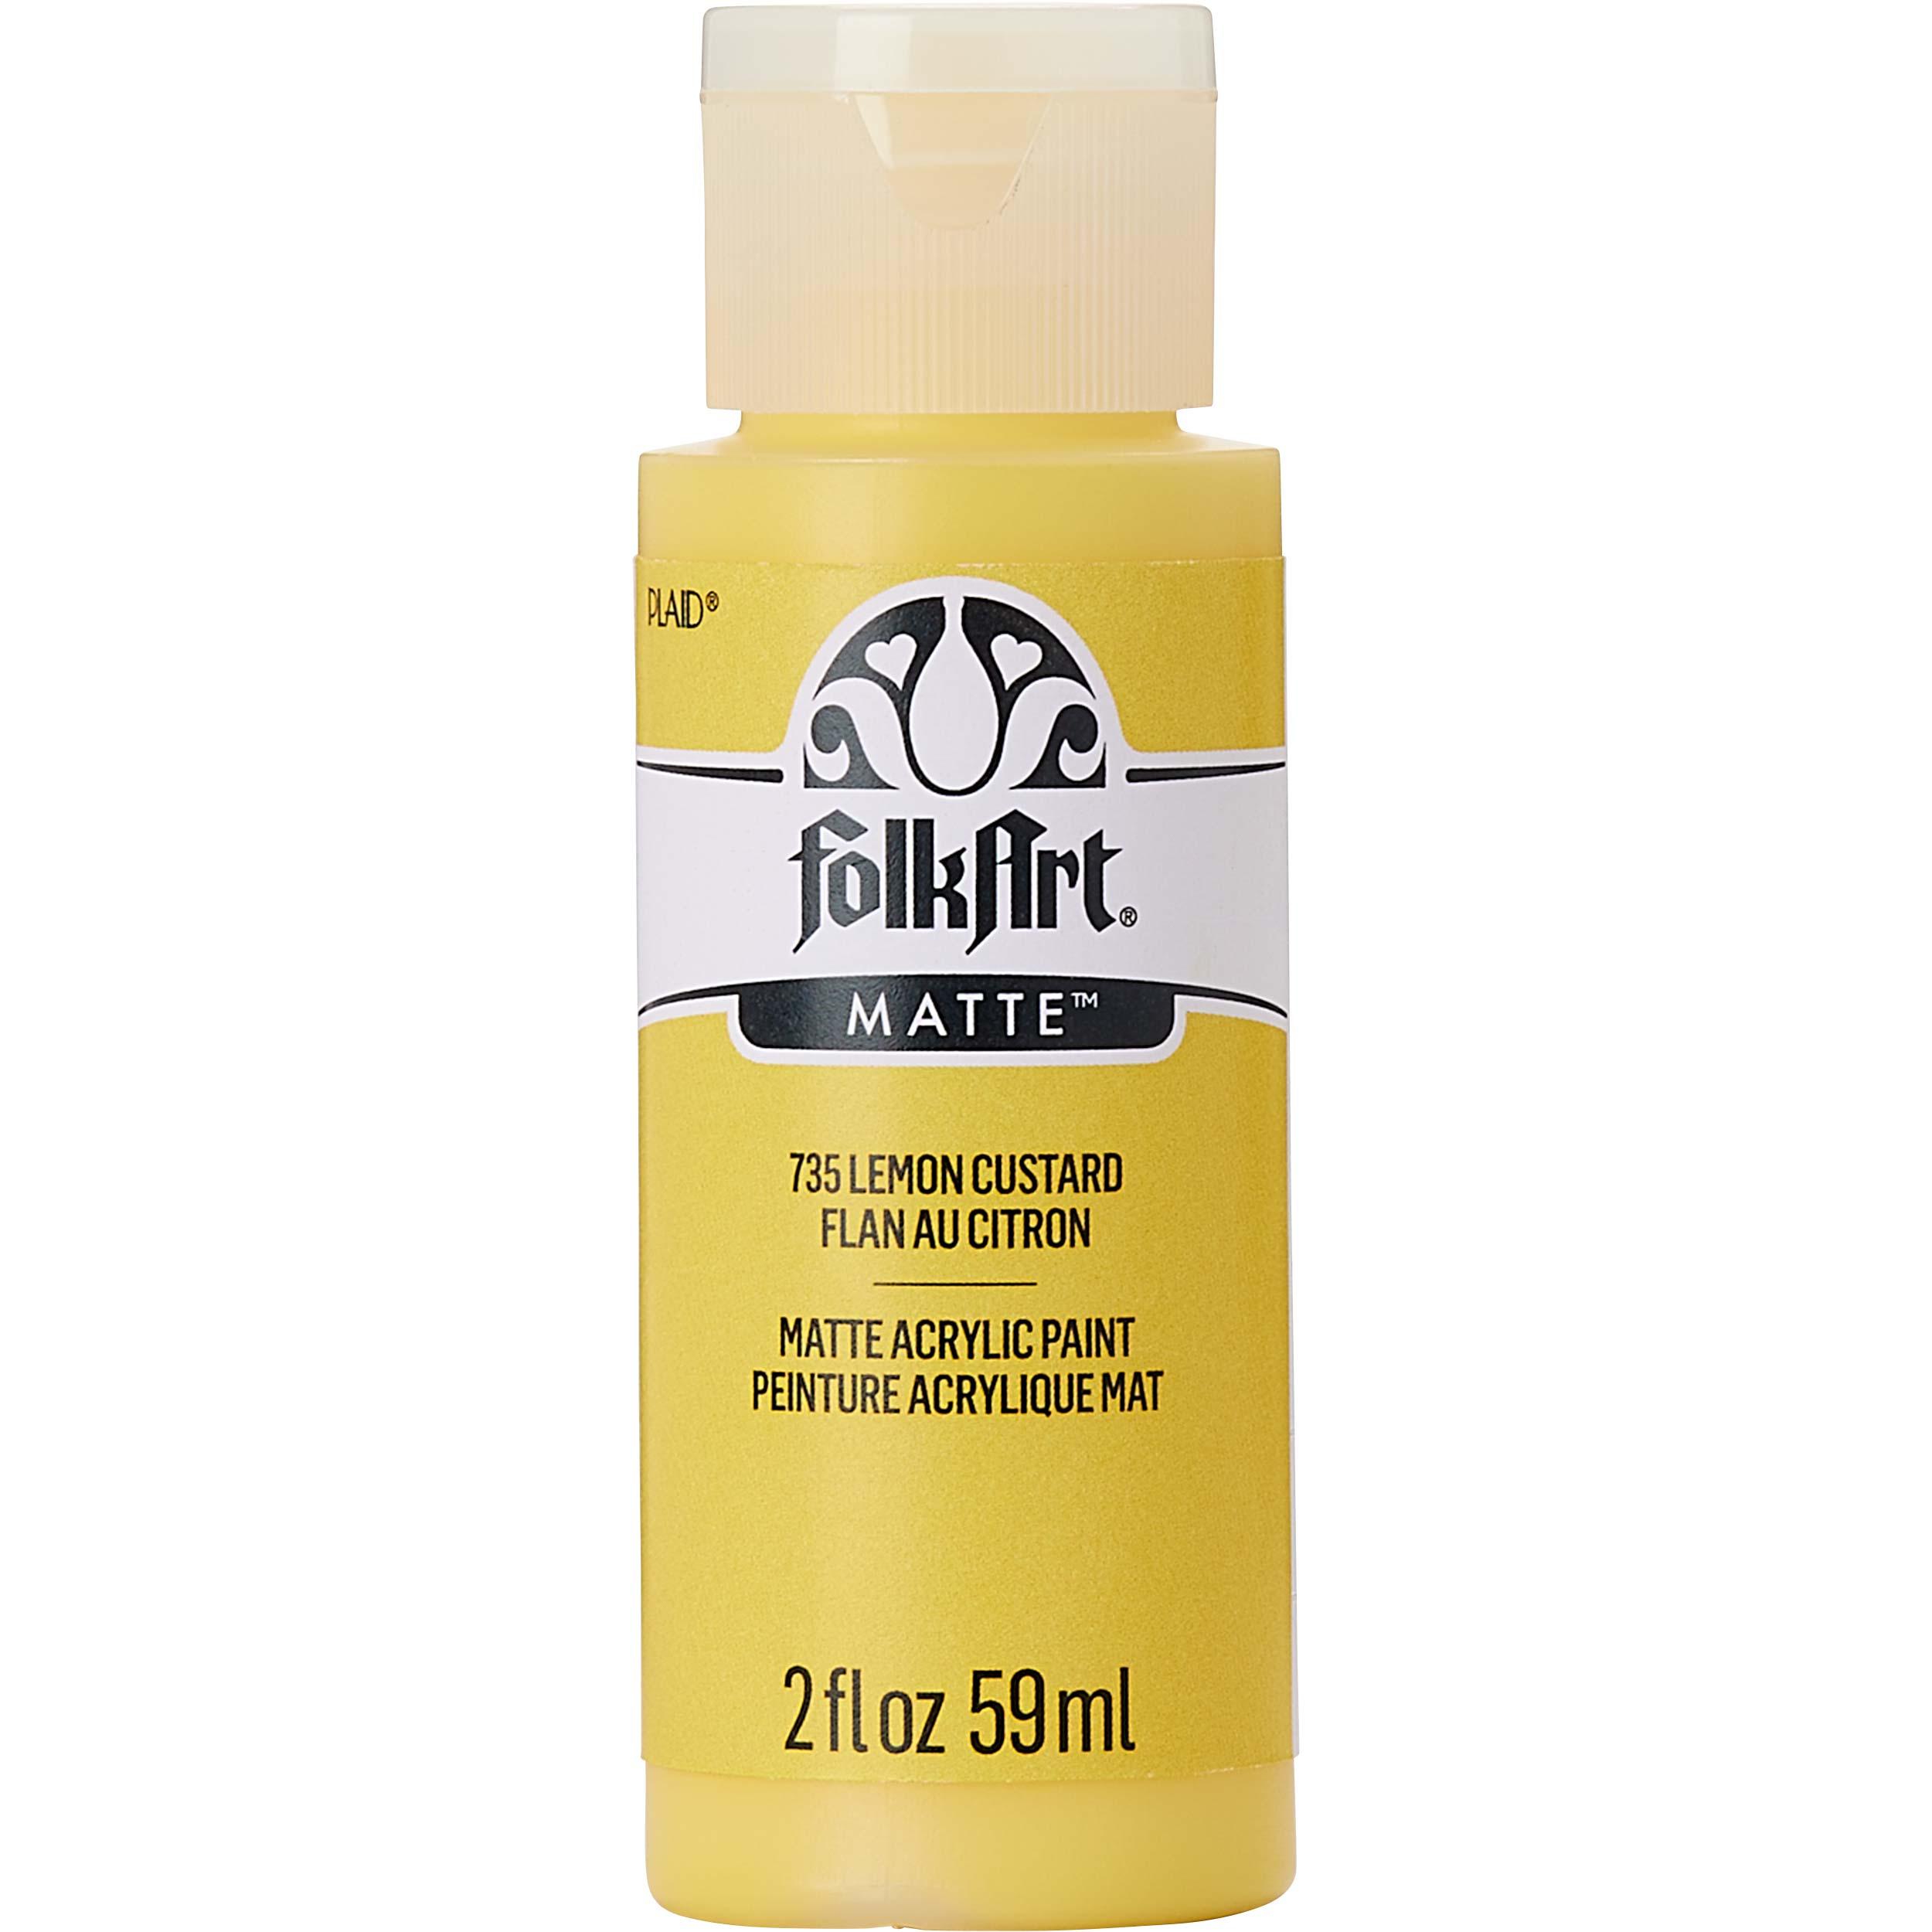 FolkArt ® Acrylic Colors - Lemon Custard, 2 oz. - 735